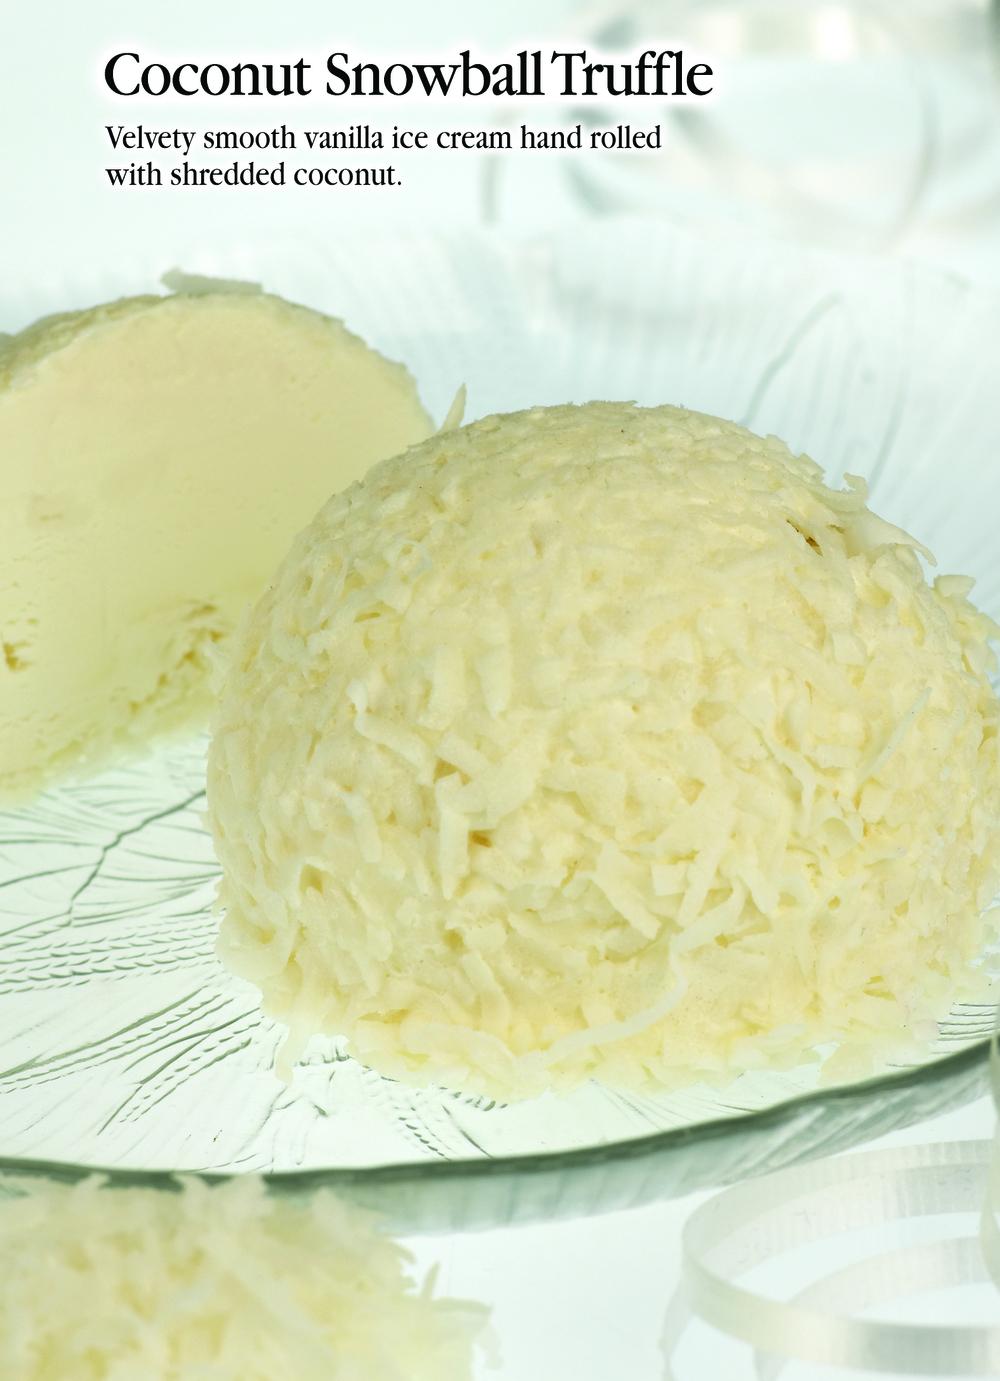 Coconut Snowball Truffle menu.jpg